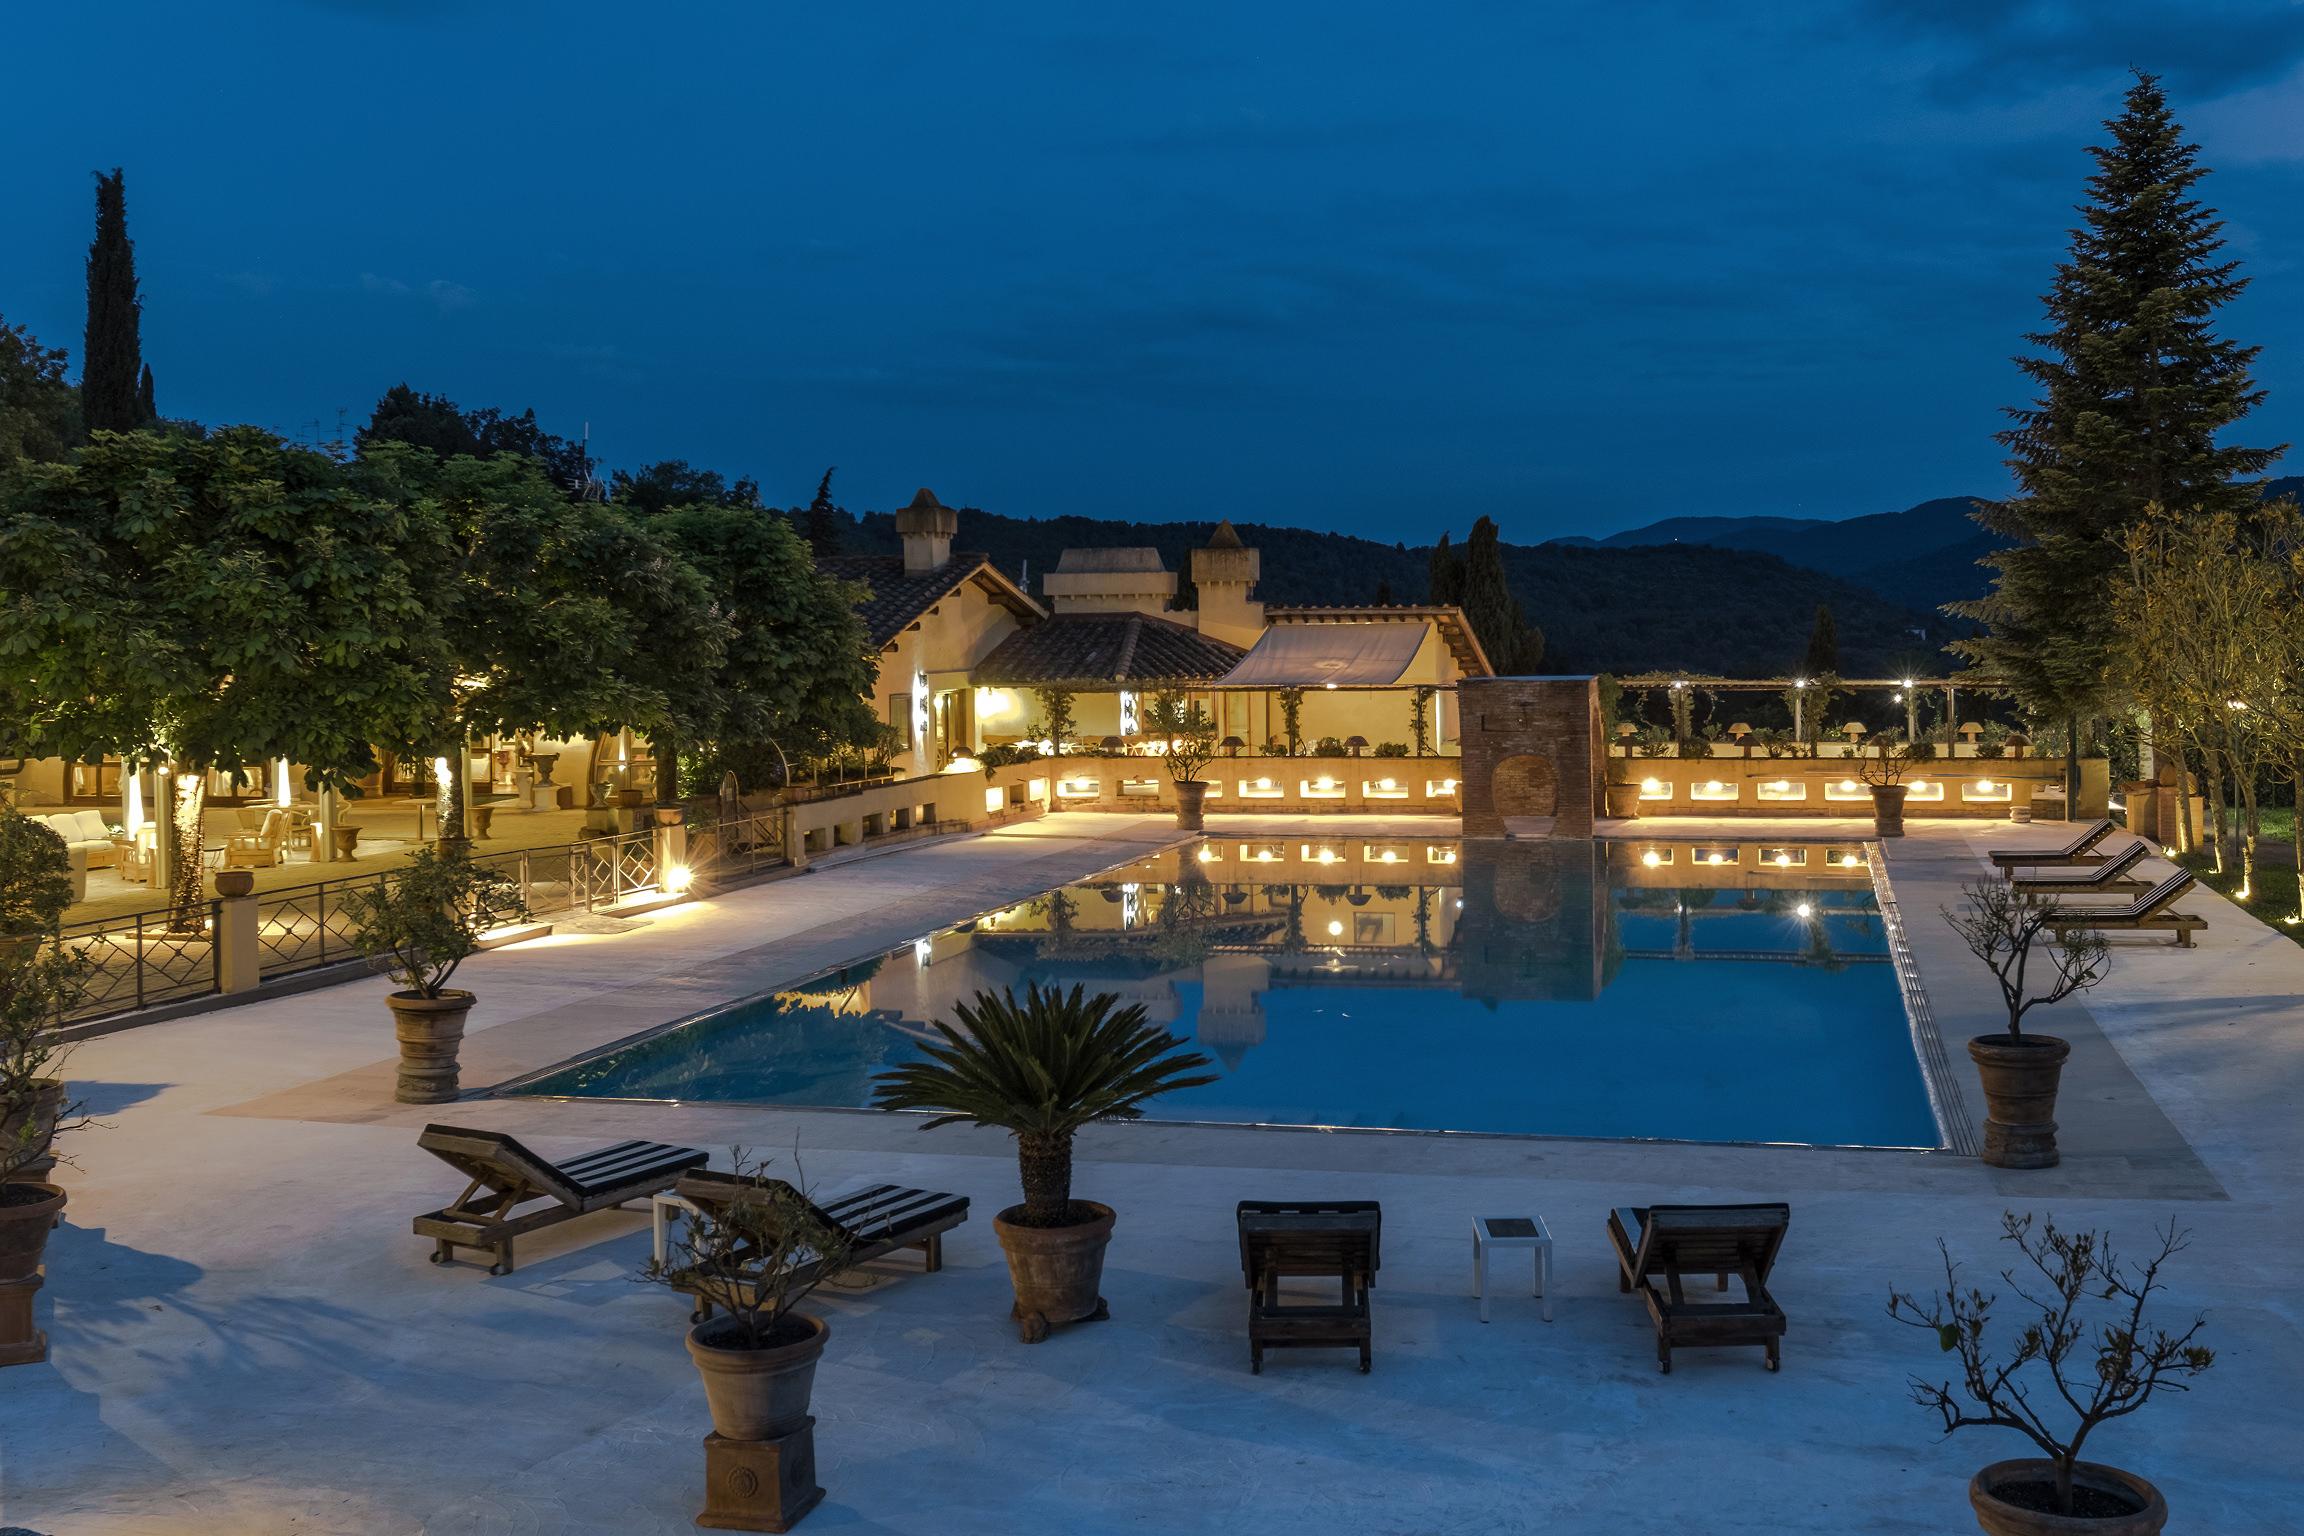 florence holiday rentals - italy tuscany florence - luxury villa